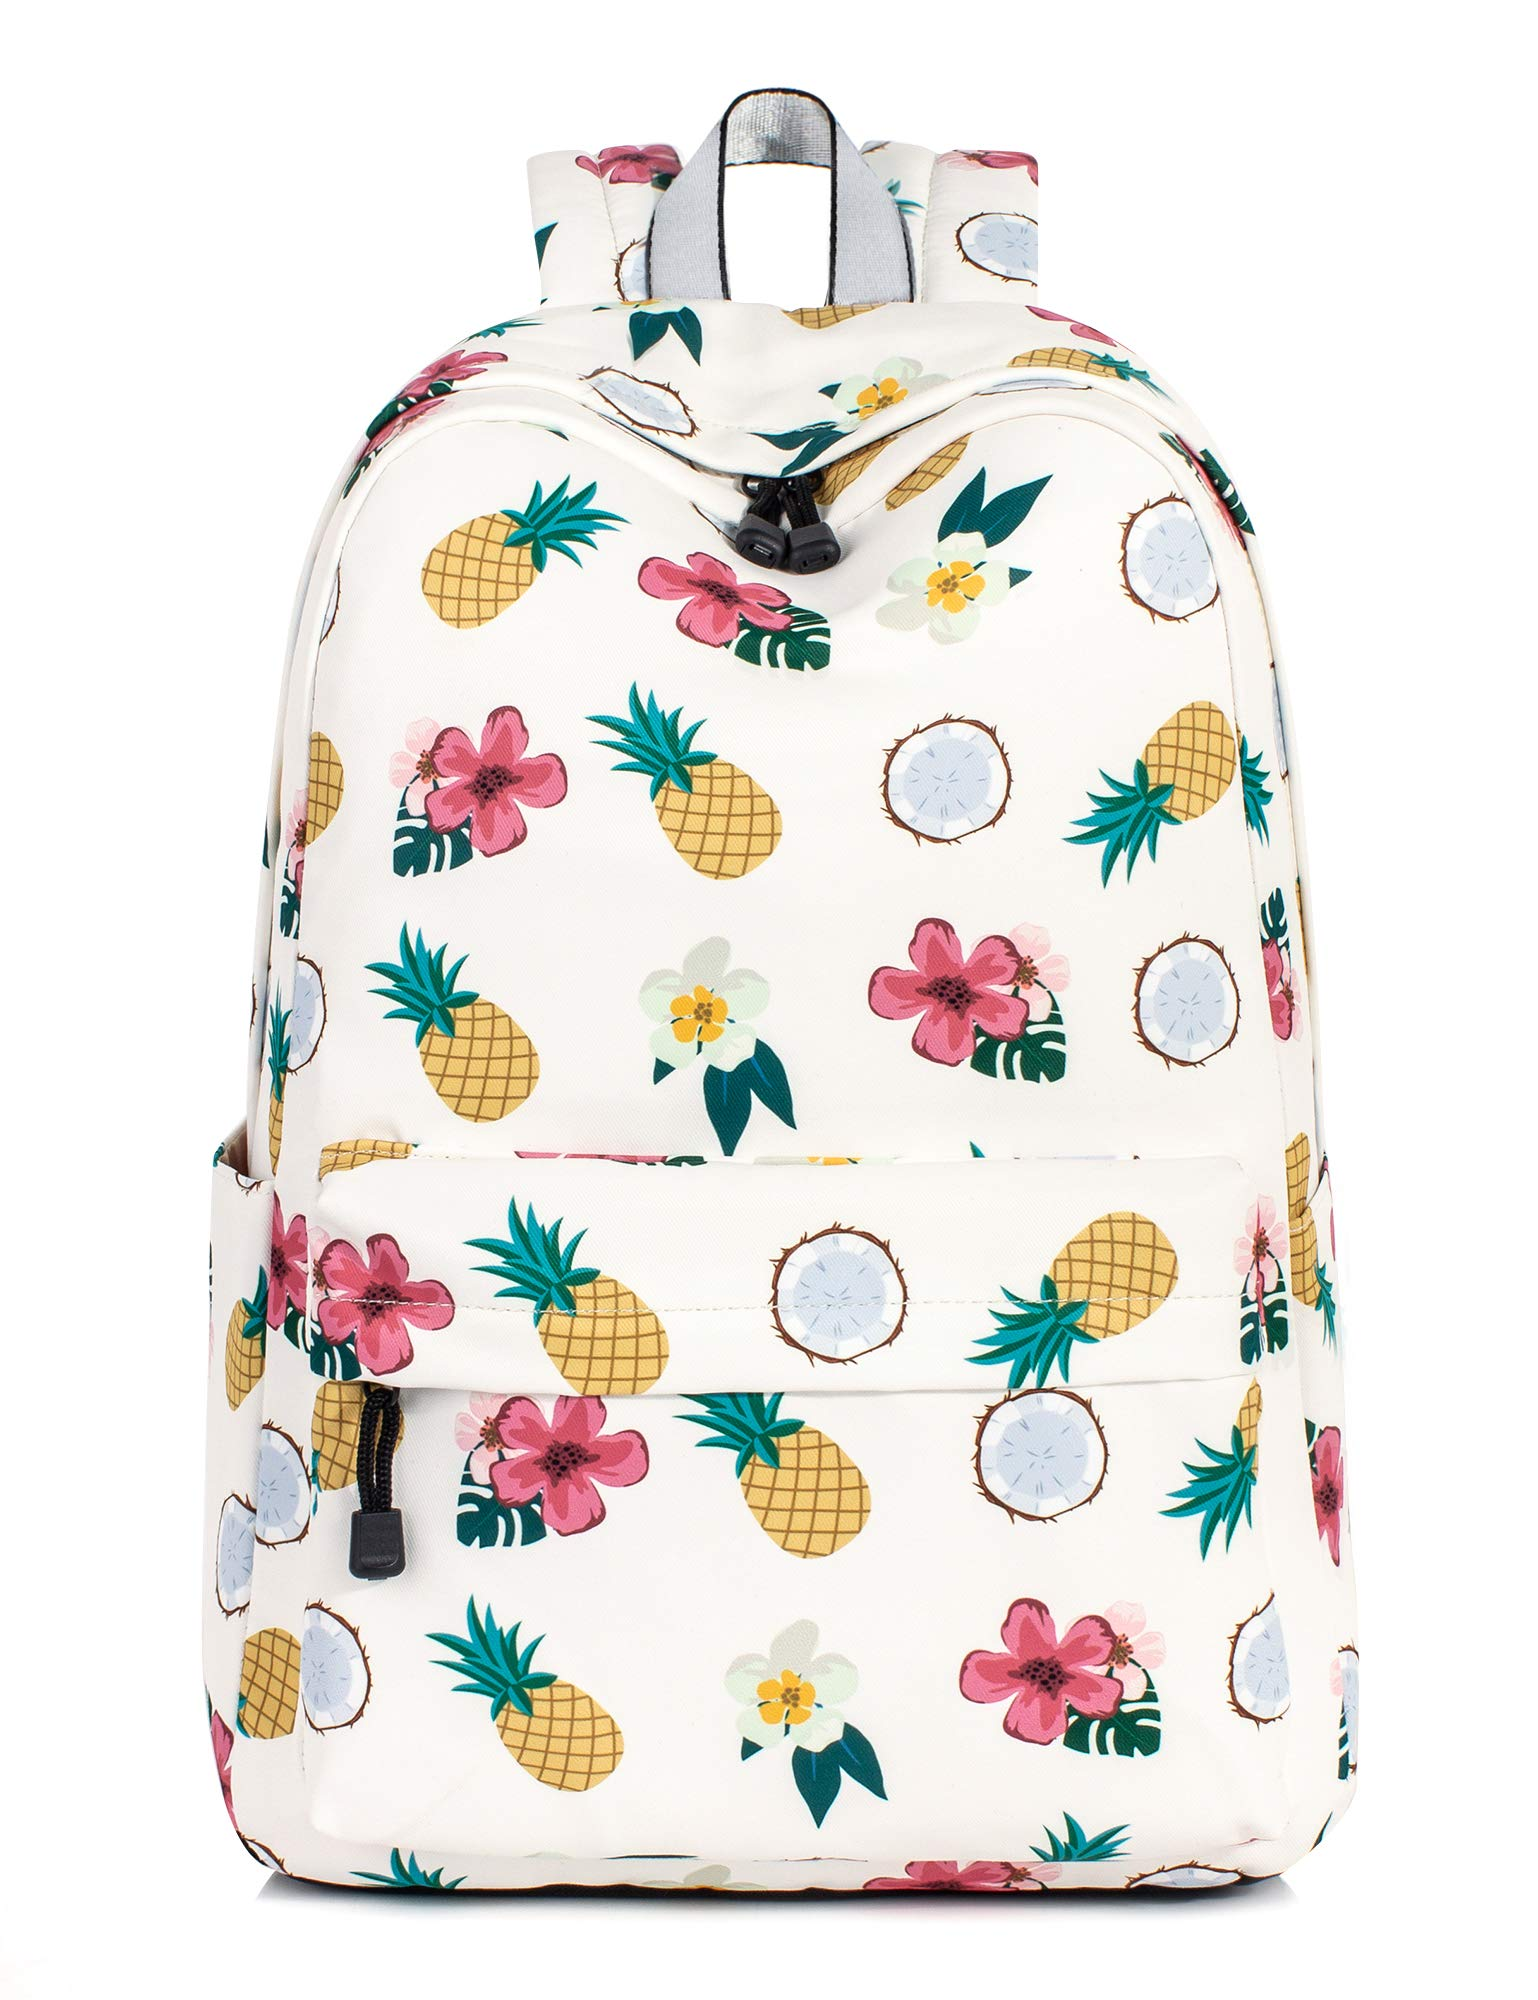 School Bookbags for Girls, Cute Pineapple Backpack College Bags Women Daypack Travel Bag by Leaper (Beige)